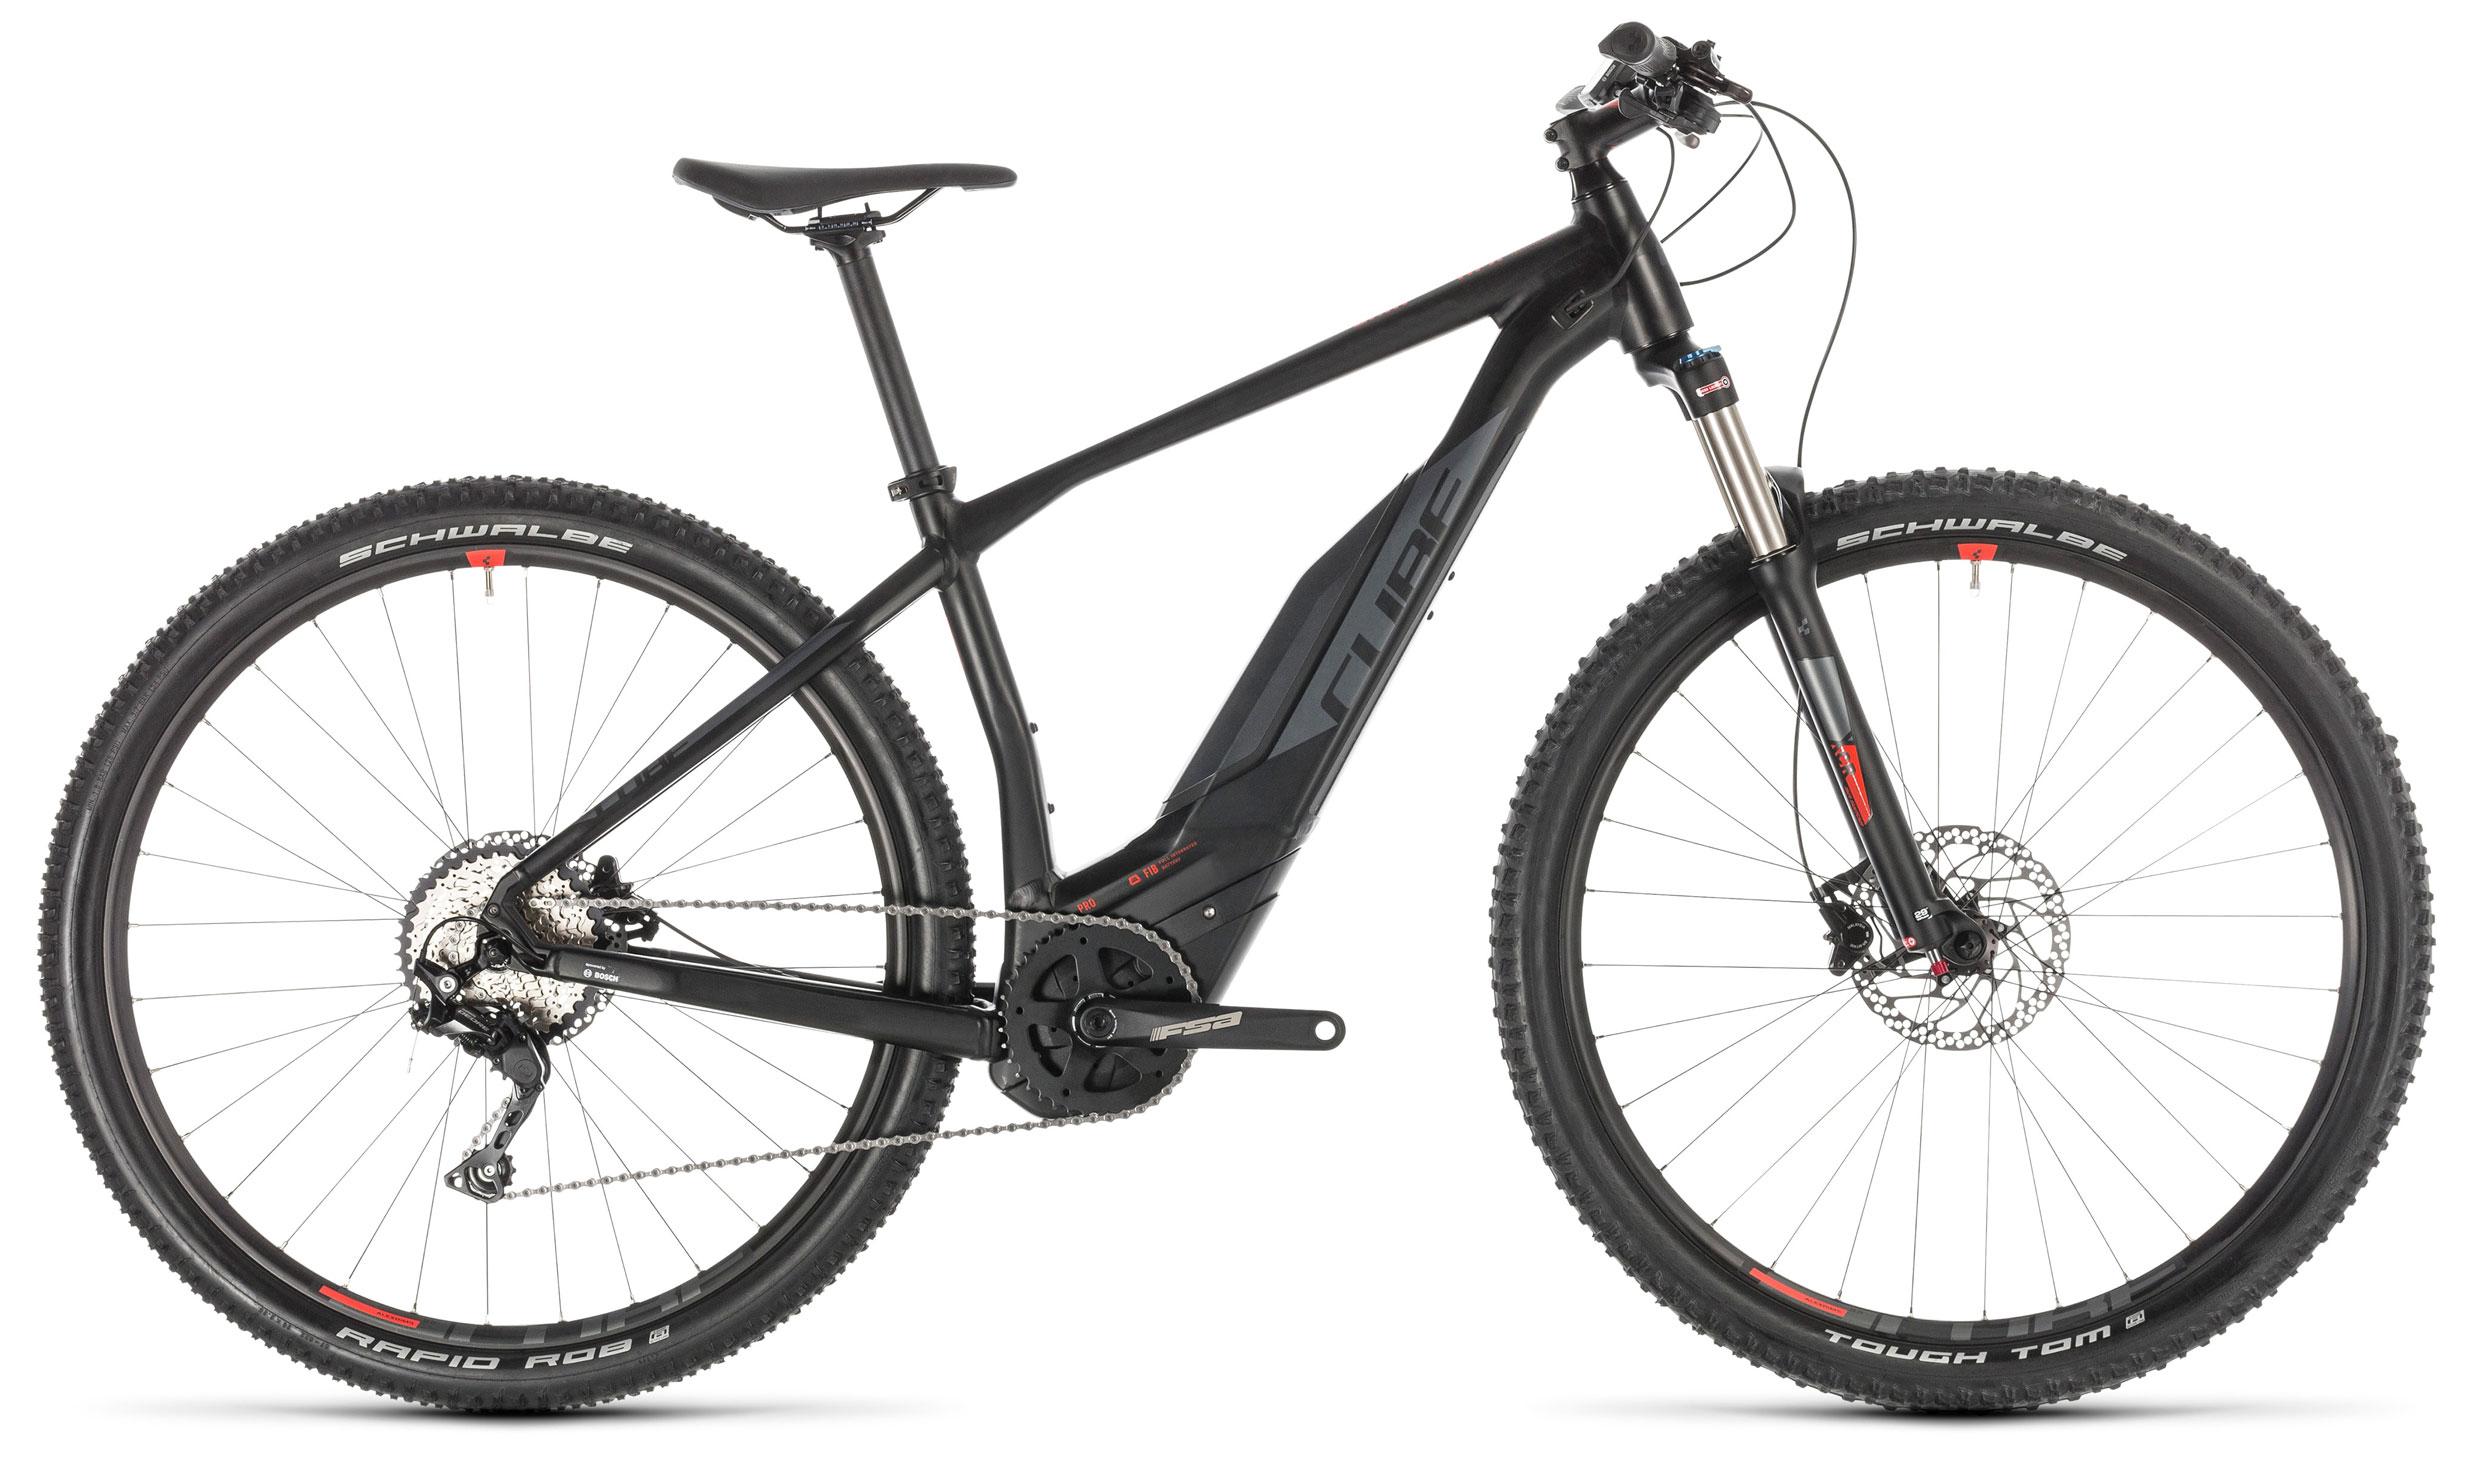 Велосипед Cube Acid Hybrid Pro 500 29 2019 велосипед cube agree gtc pro 2015